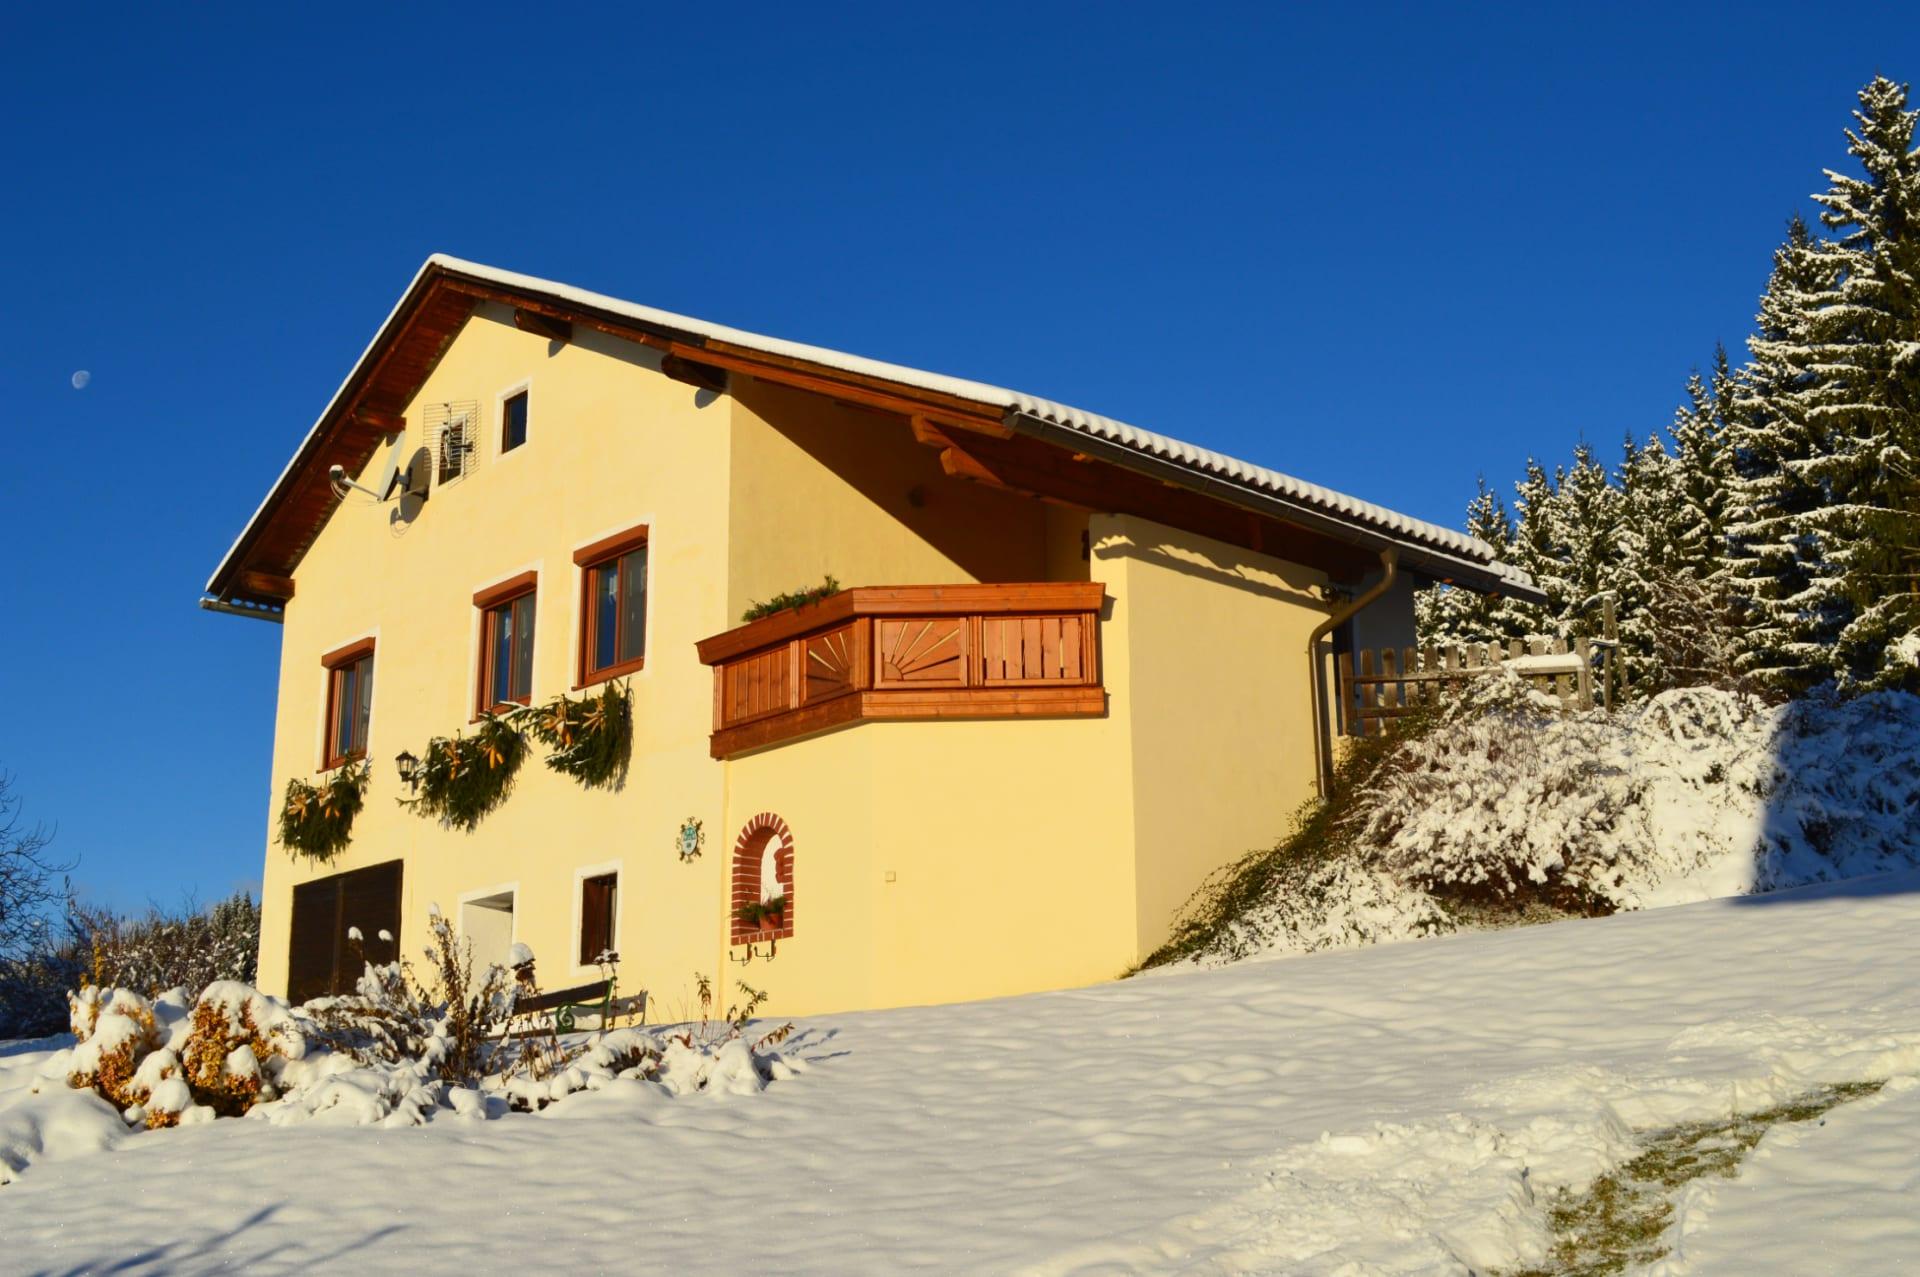 Pembergerhof